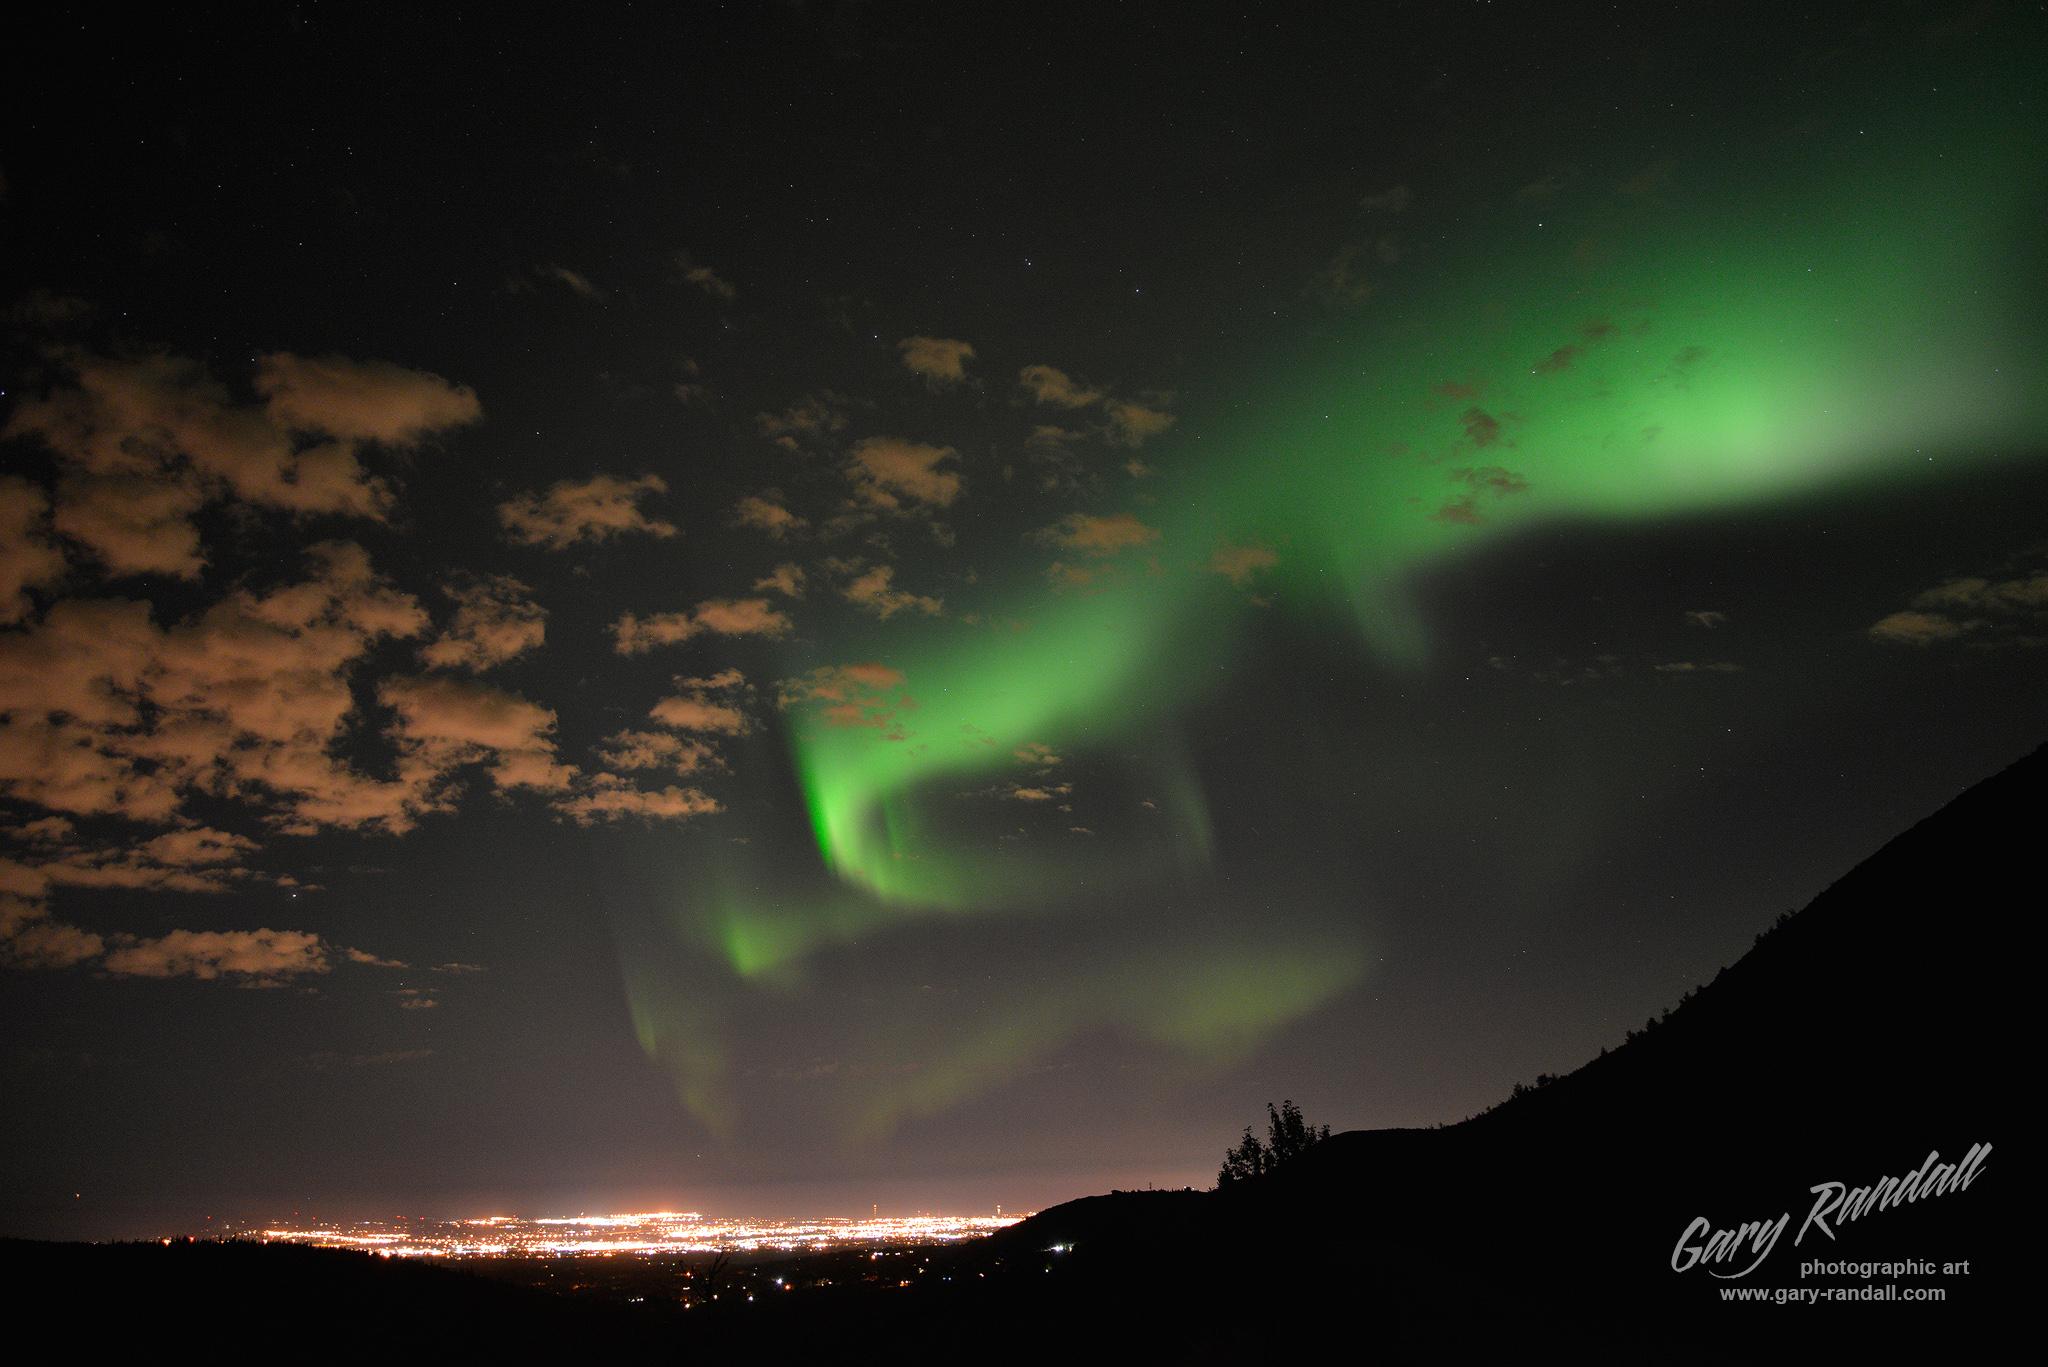 The Northern Lights over Anchorage Alaska